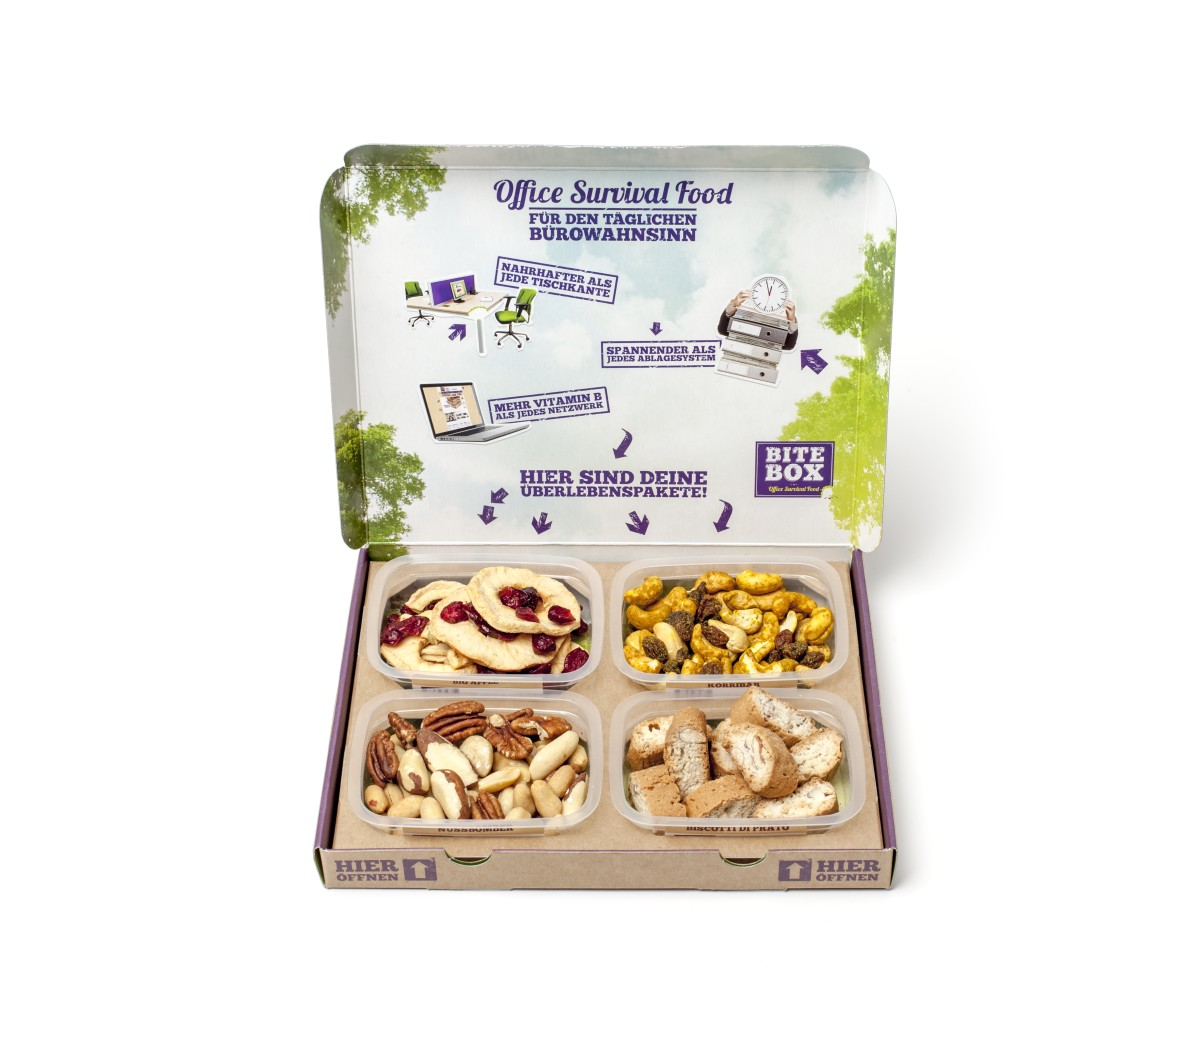 BiteBox - Office Survival Food | Quelle: BiteBox